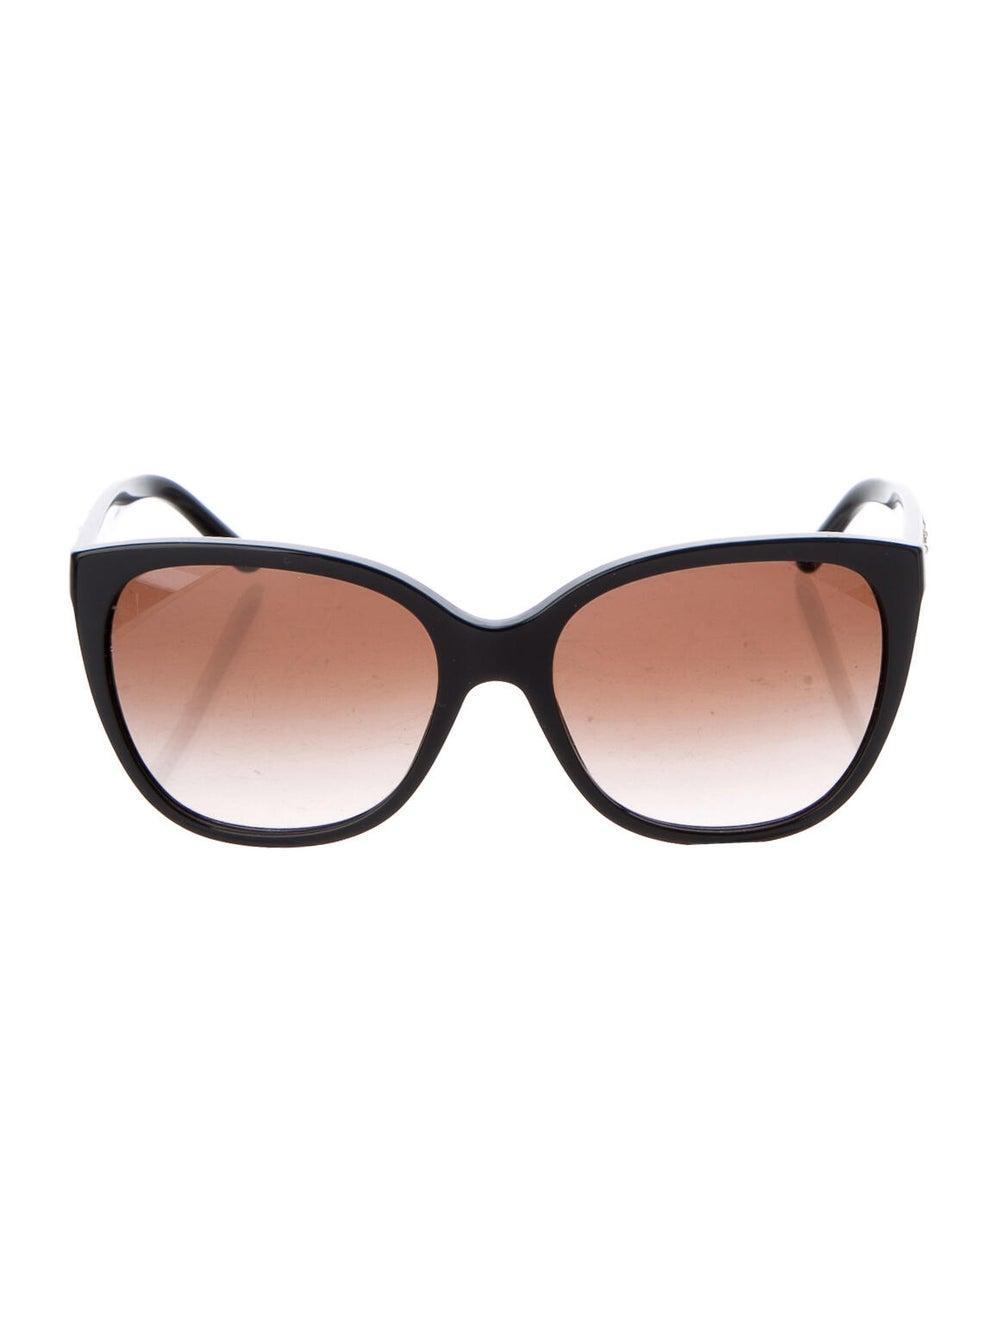 Versace Medusa Insignia Cat-Eye Sunglasses Black - image 1